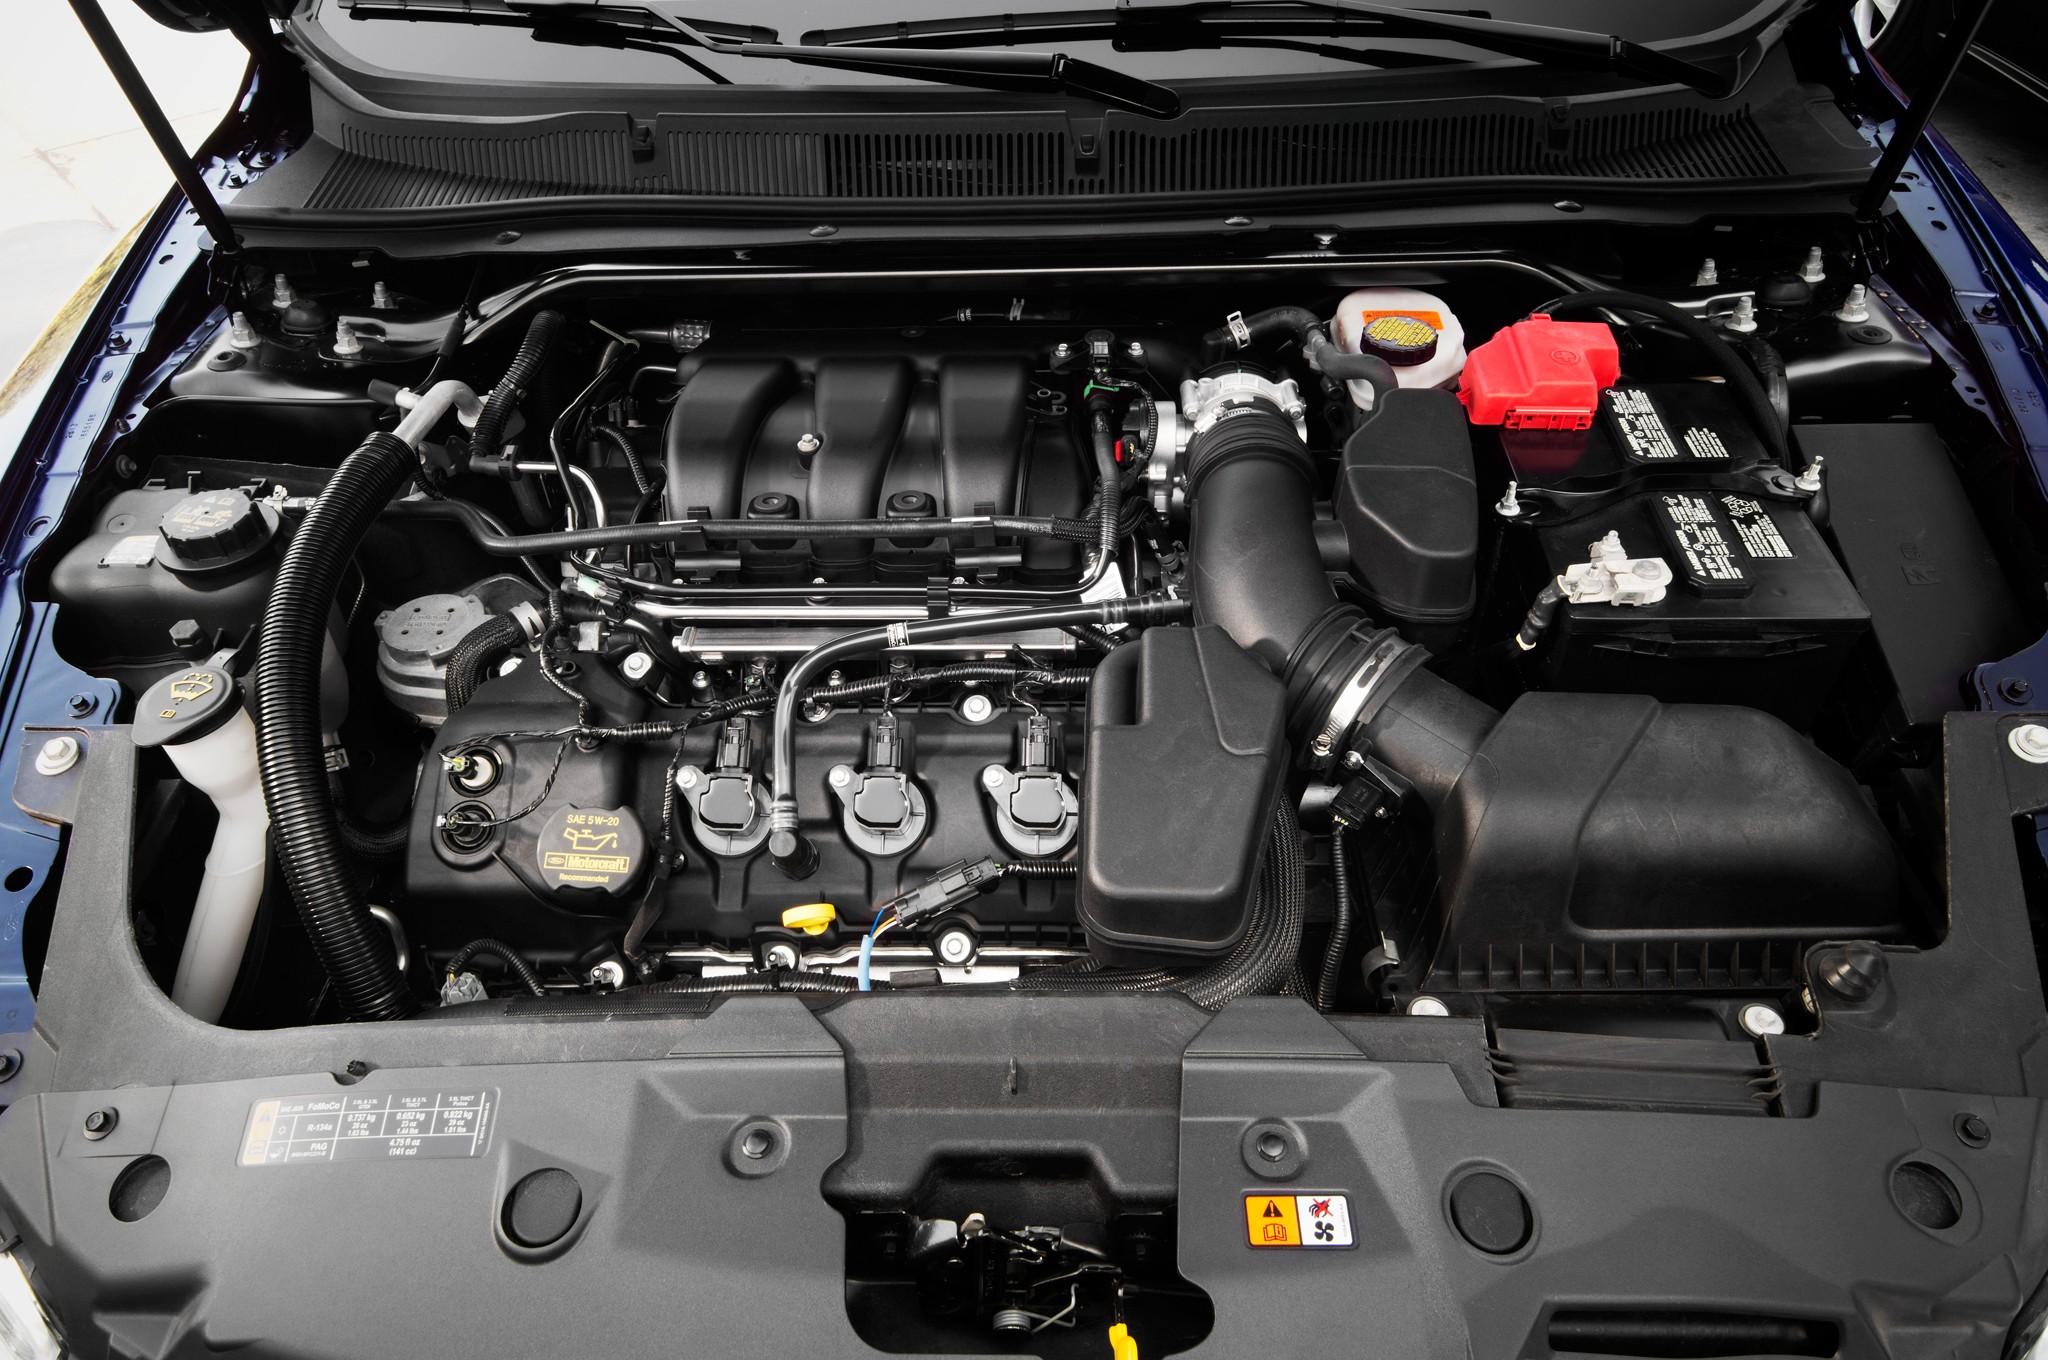 1998 ford Taurus Engine Diagram ford Taurus Price Modifications Pictures Moibibiki Of 1998 ford Taurus Engine Diagram